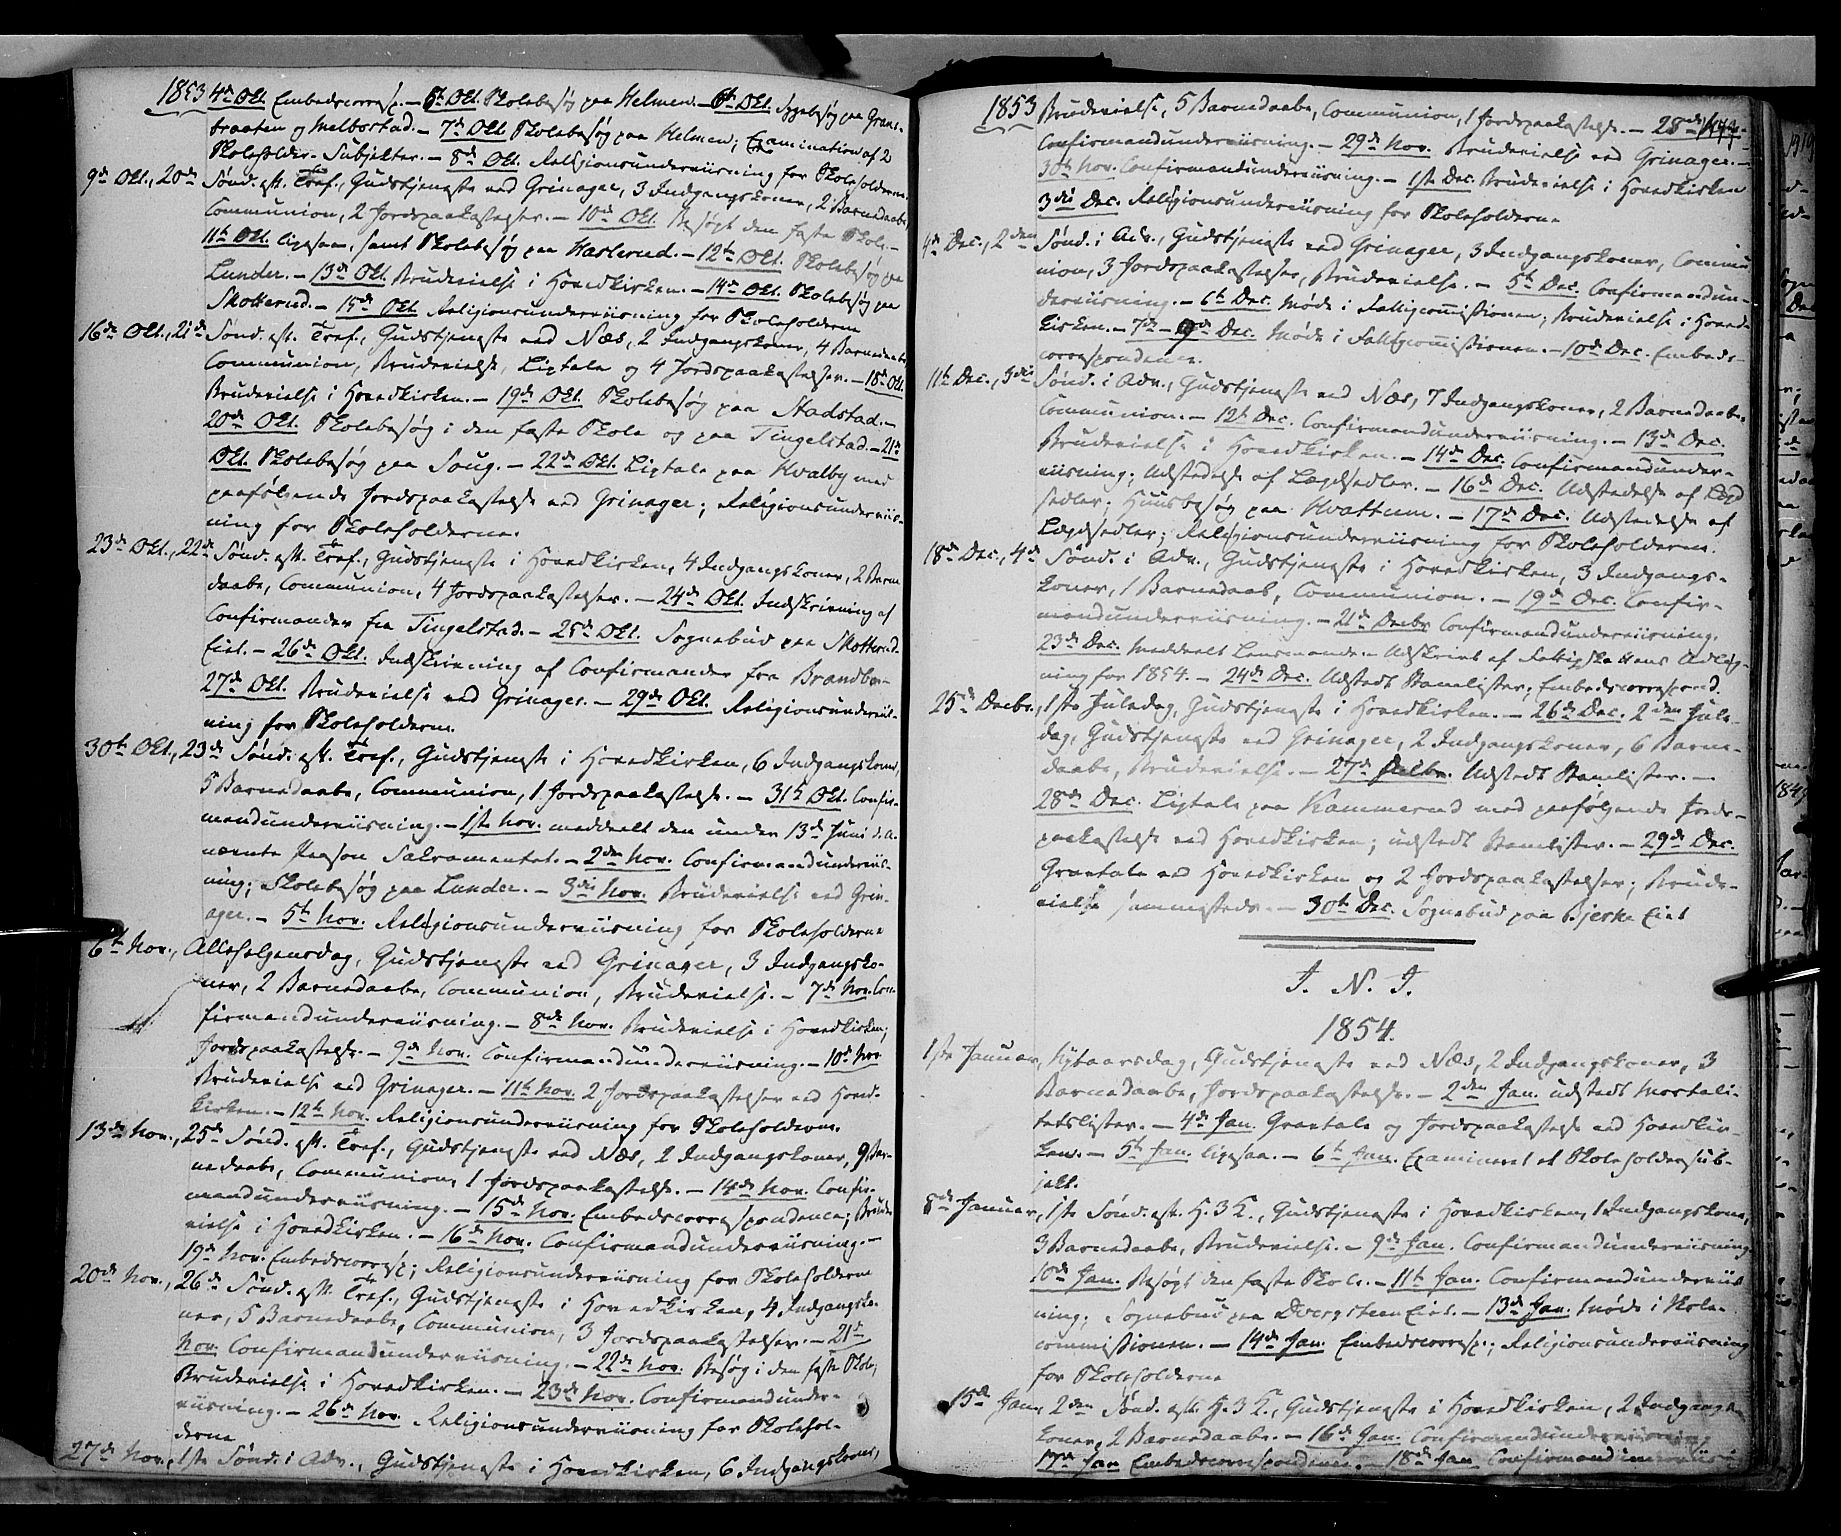 SAH, Gran prestekontor, Ministerialbok nr. 11, 1842-1856, s. 1378-1379